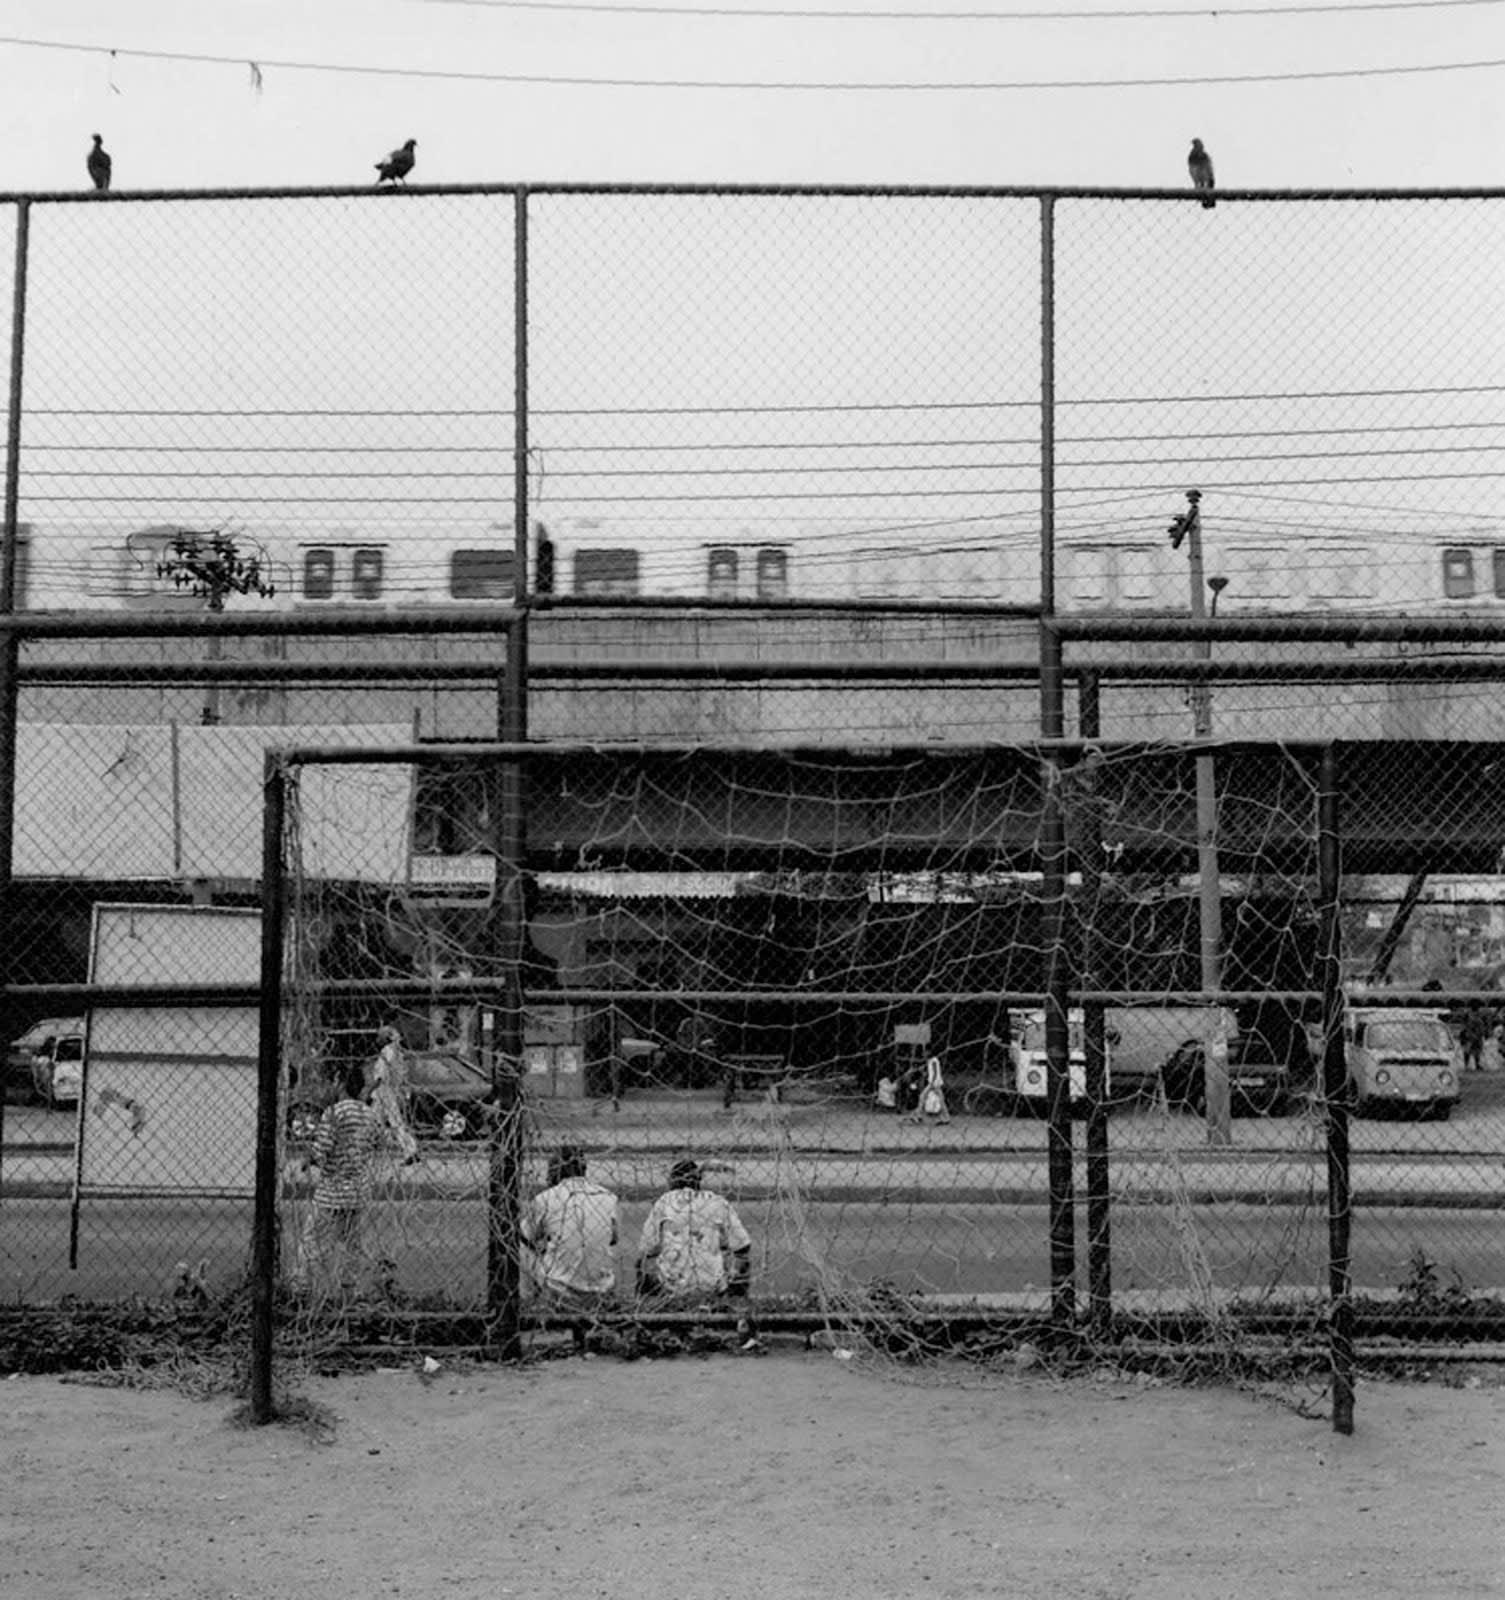 Pierre Schwartz, Rio de Janeiro #4, Brésil, 2001